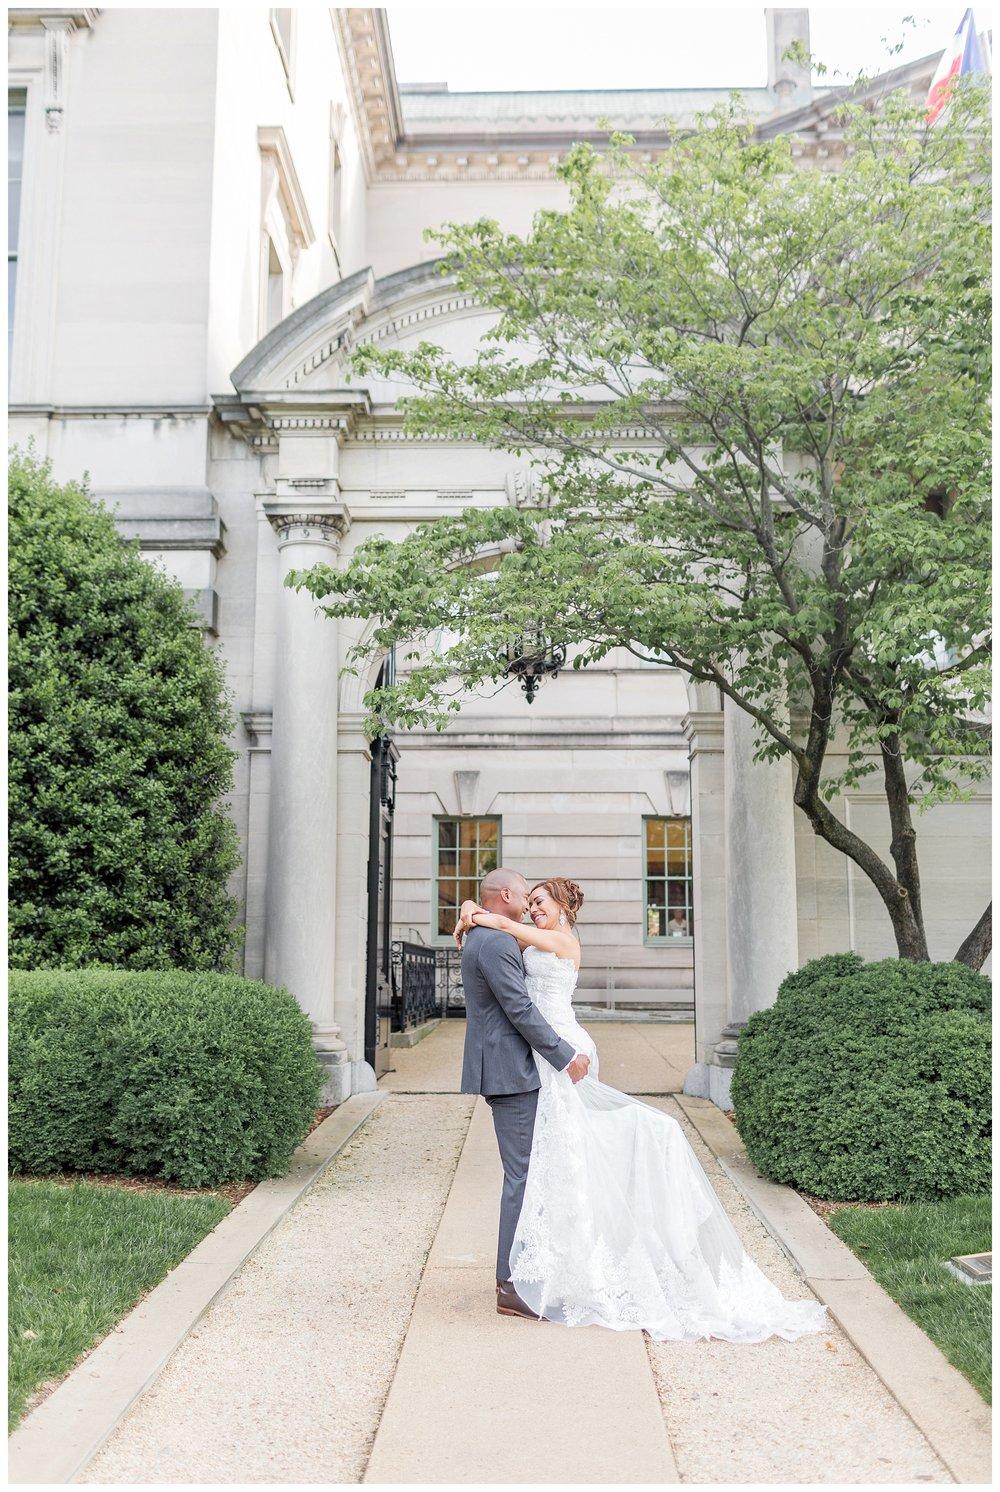 Anderson House Wedding DC Wedding Photographer Kir Tuben_0039.jpg